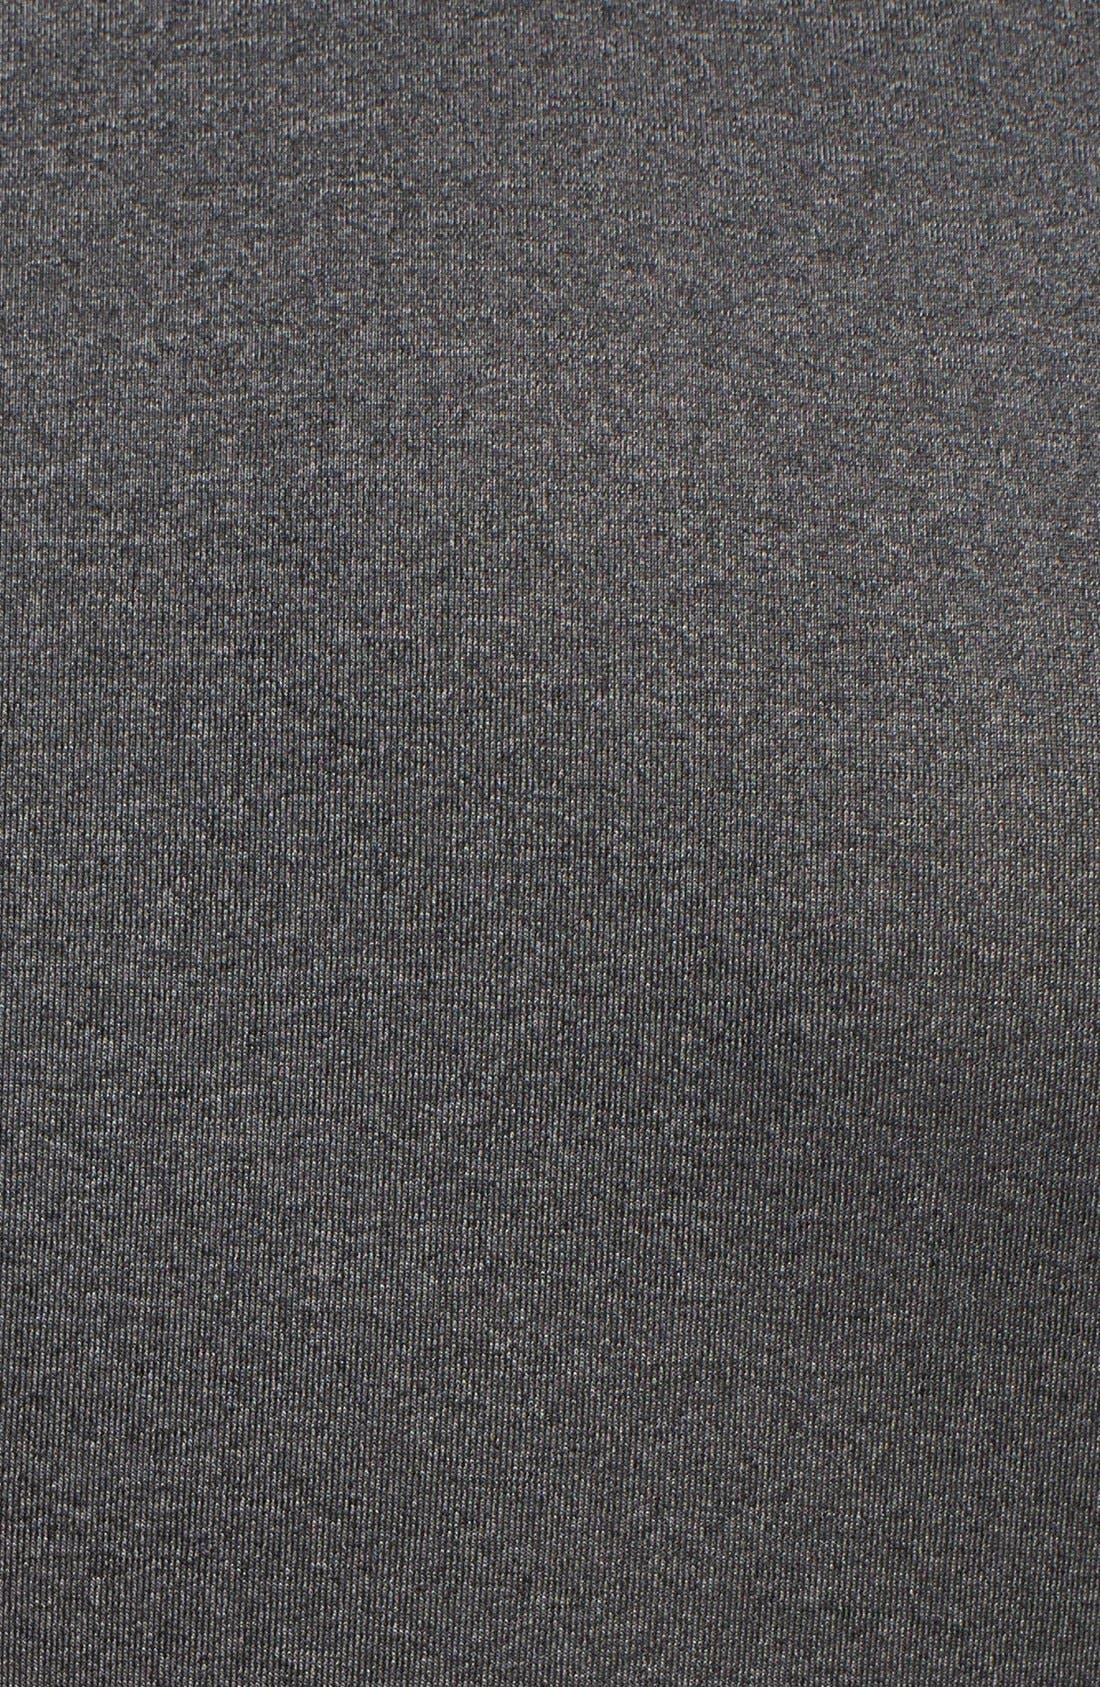 HeatGear<sup>®</sup> Compression Fit Long Sleeve T-Shirt,                             Alternate thumbnail 8, color,                             CARBON HEATHER/ BLACK